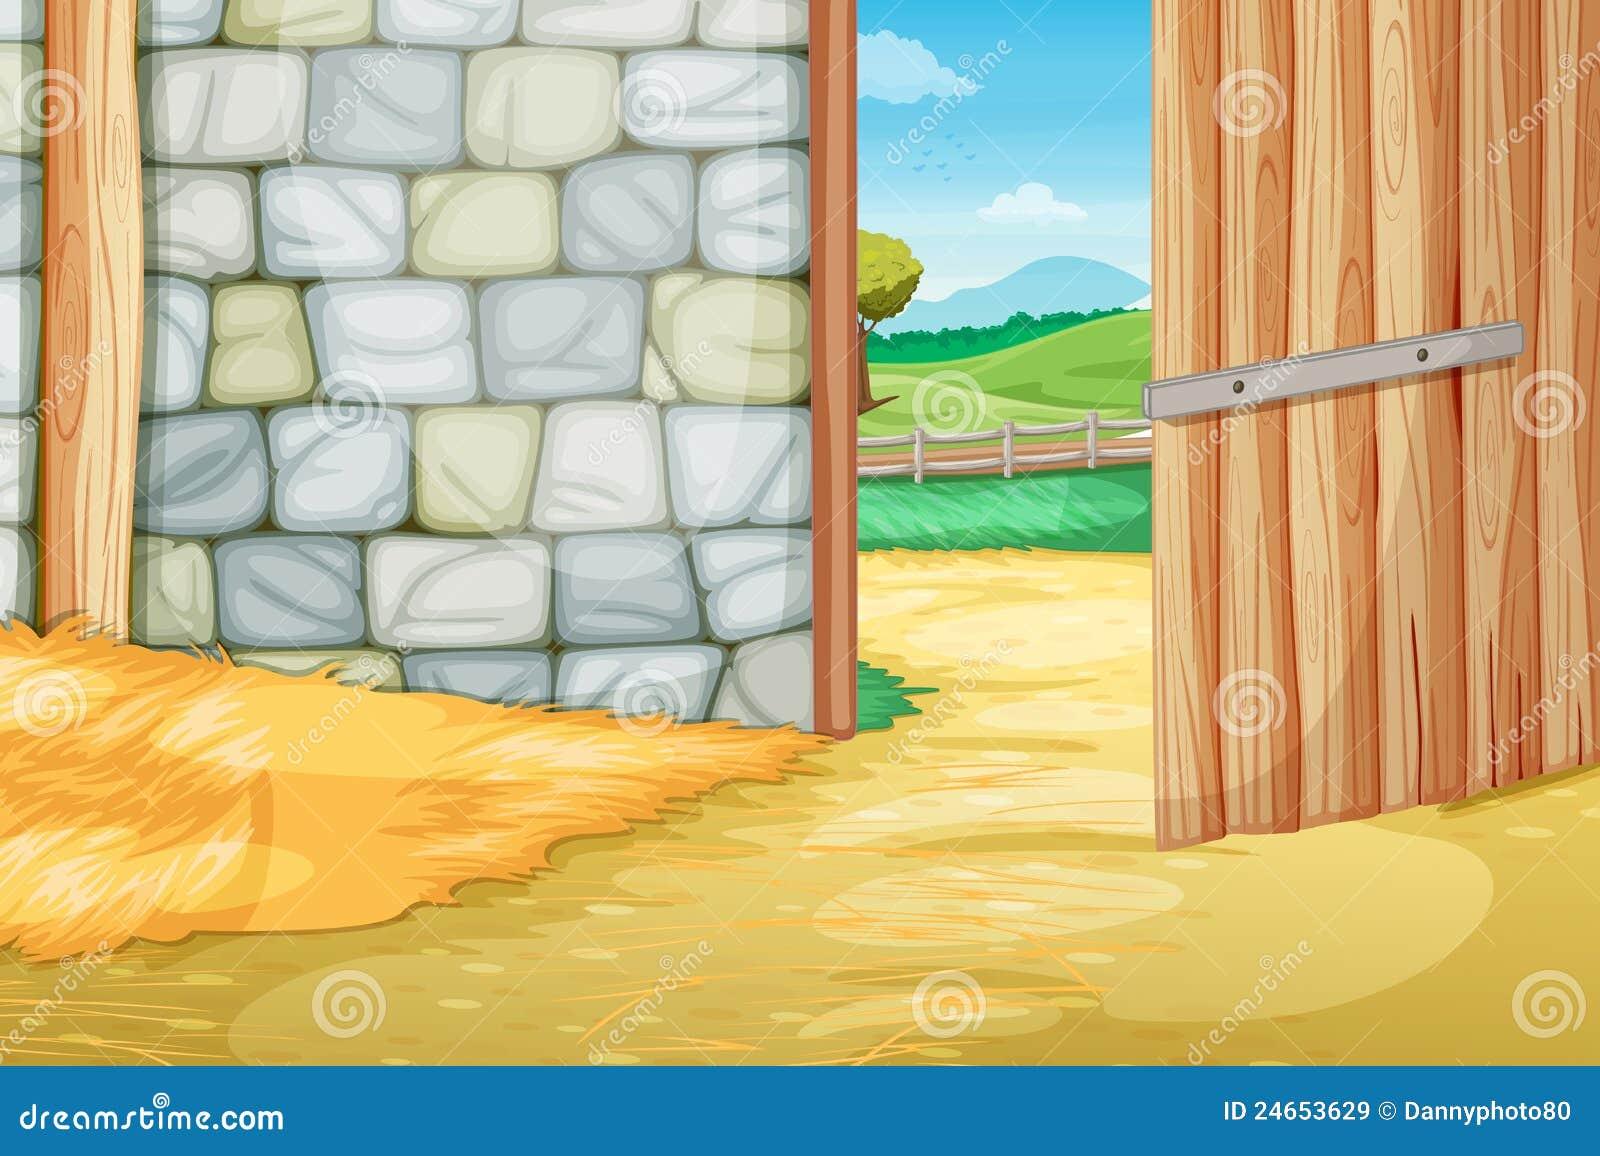 Inside The Barn Stock Vector Illustration Of Clipart